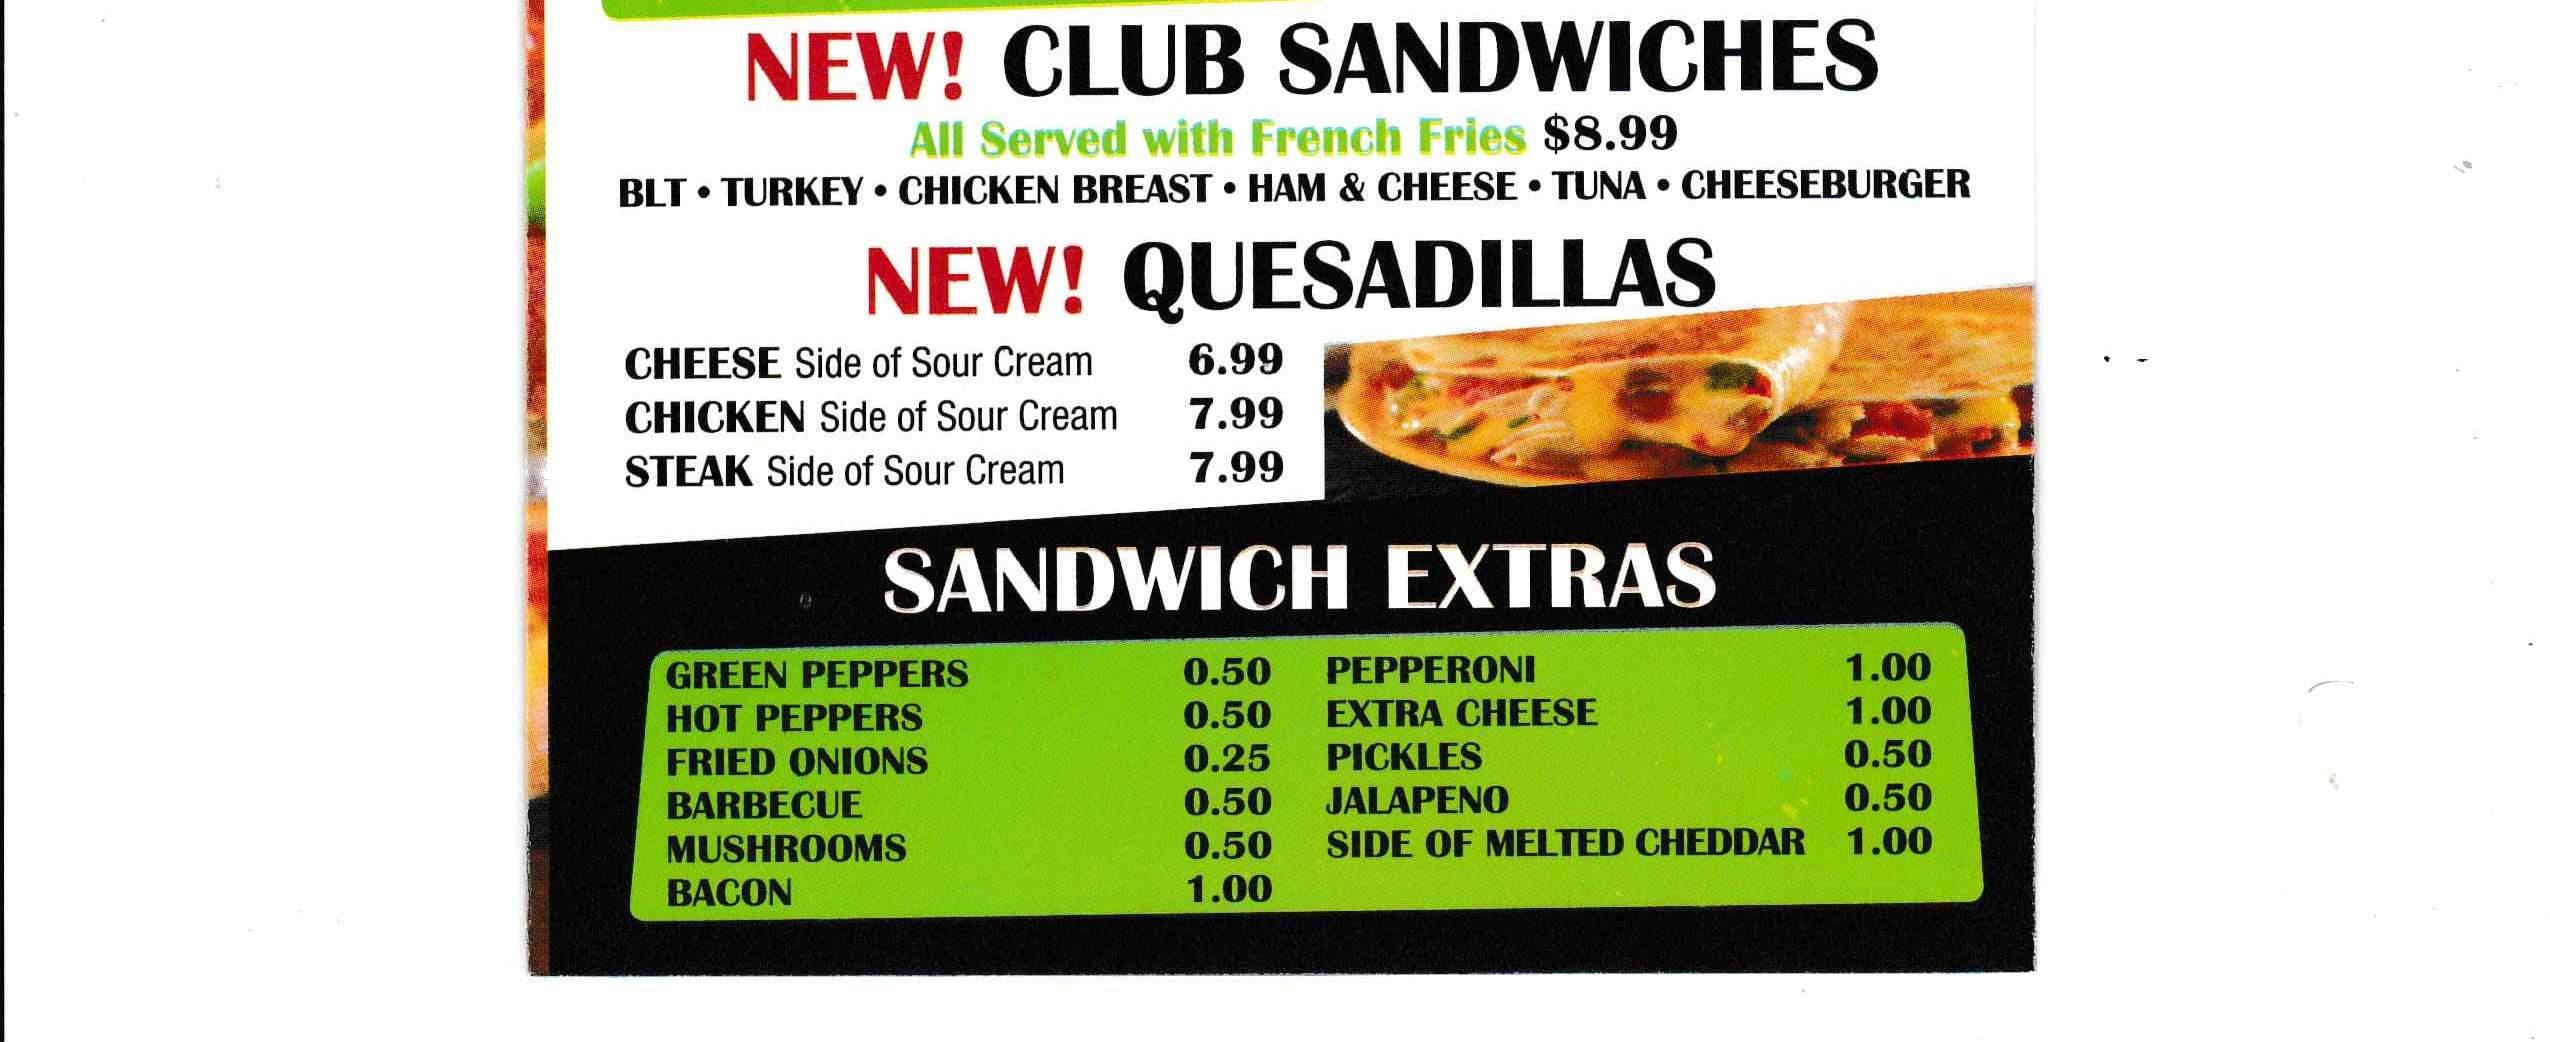 Club Sandwiches - Quesadillas ~ Sandwiches Extras